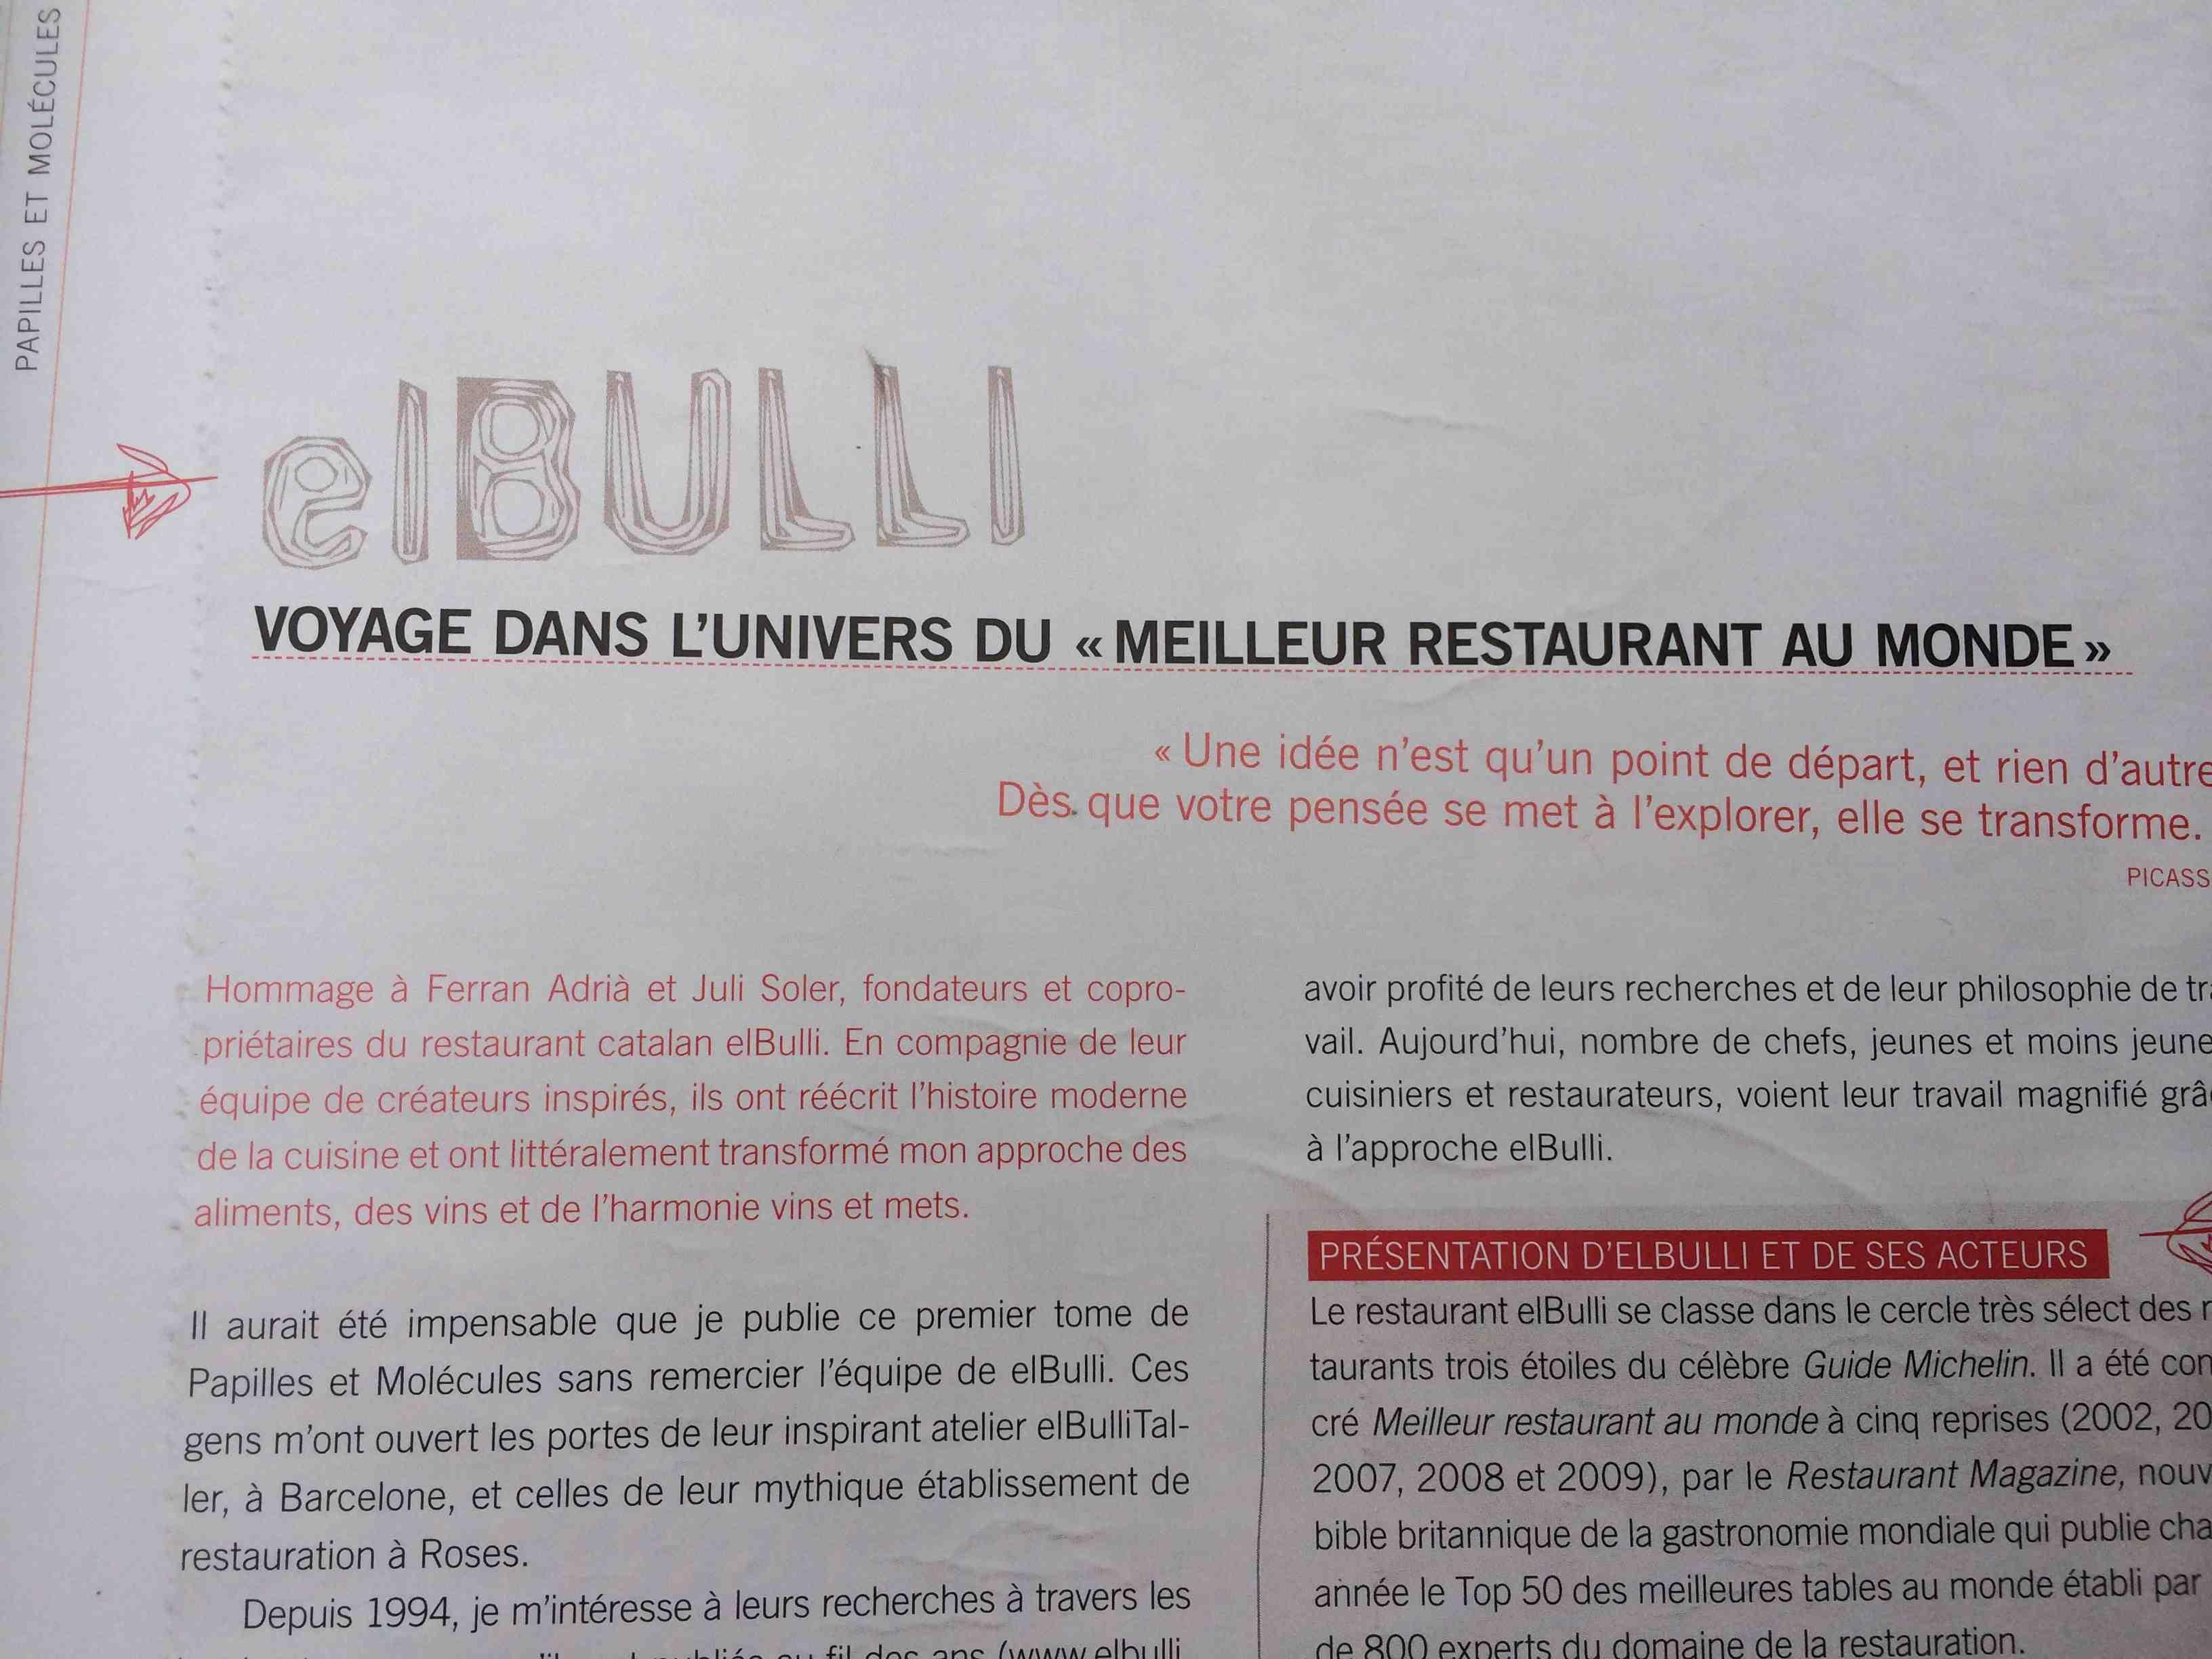 Restaurant elBulli